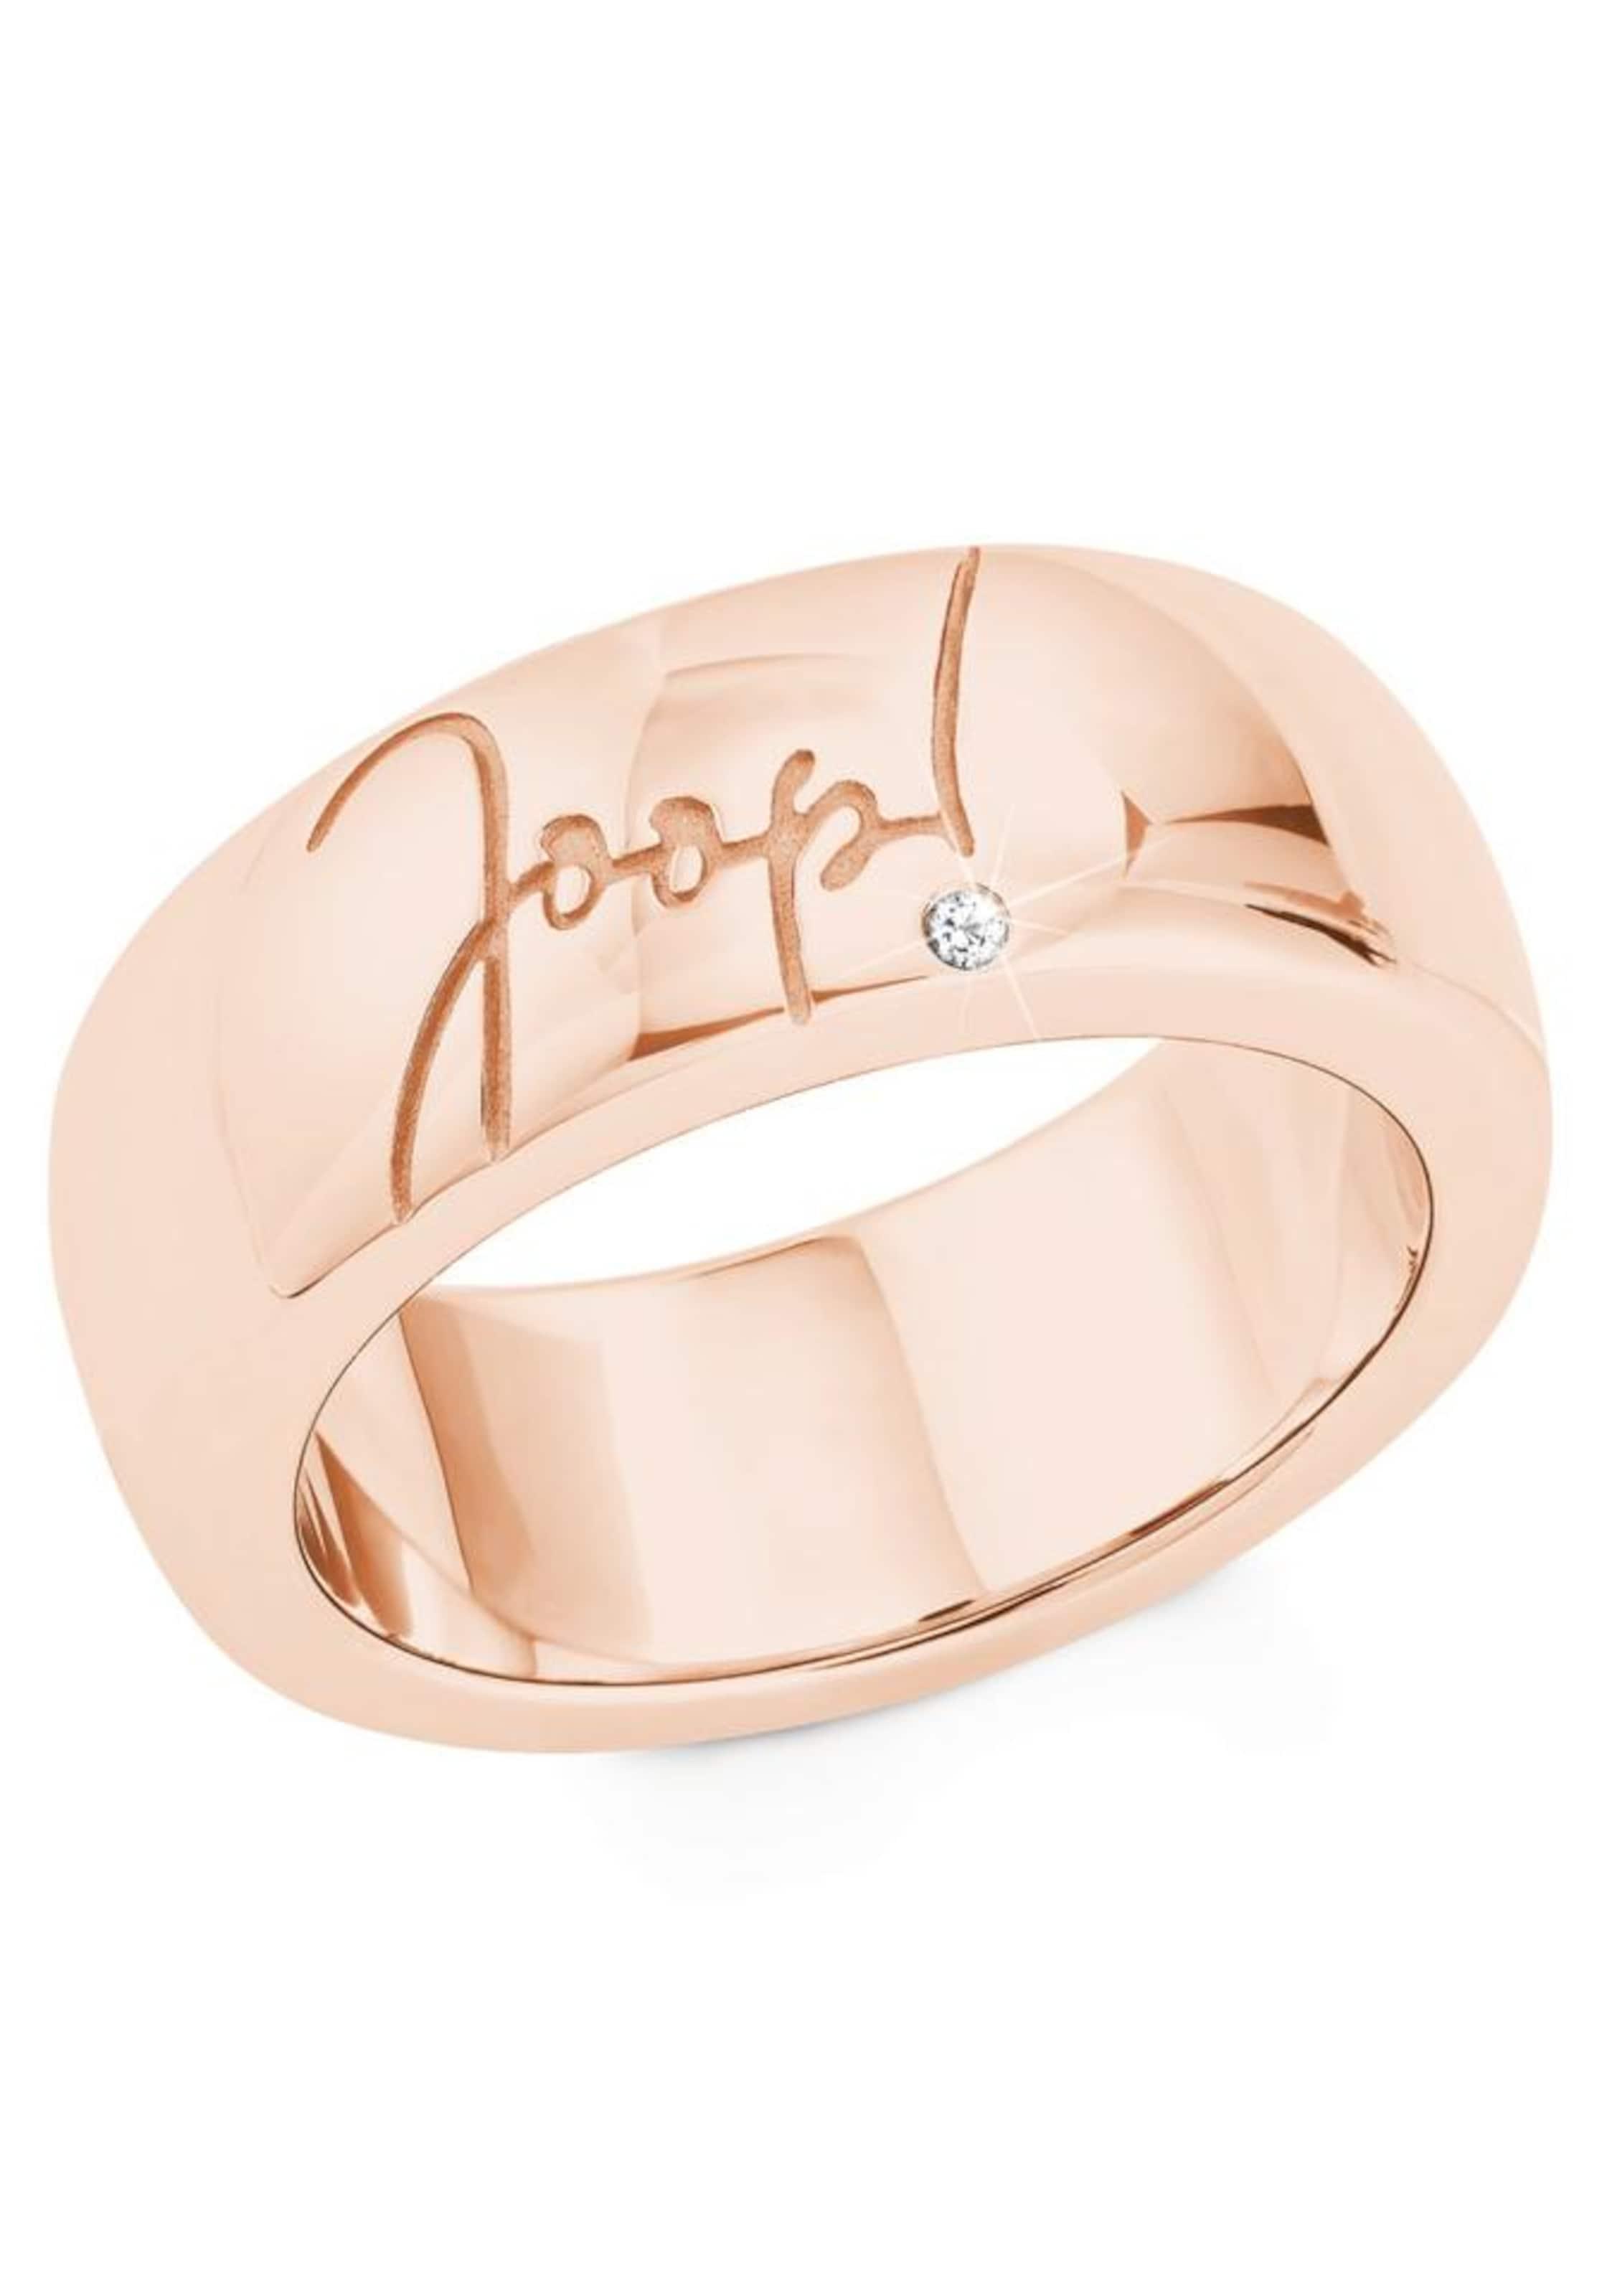 JOOP! Ring in rosegold